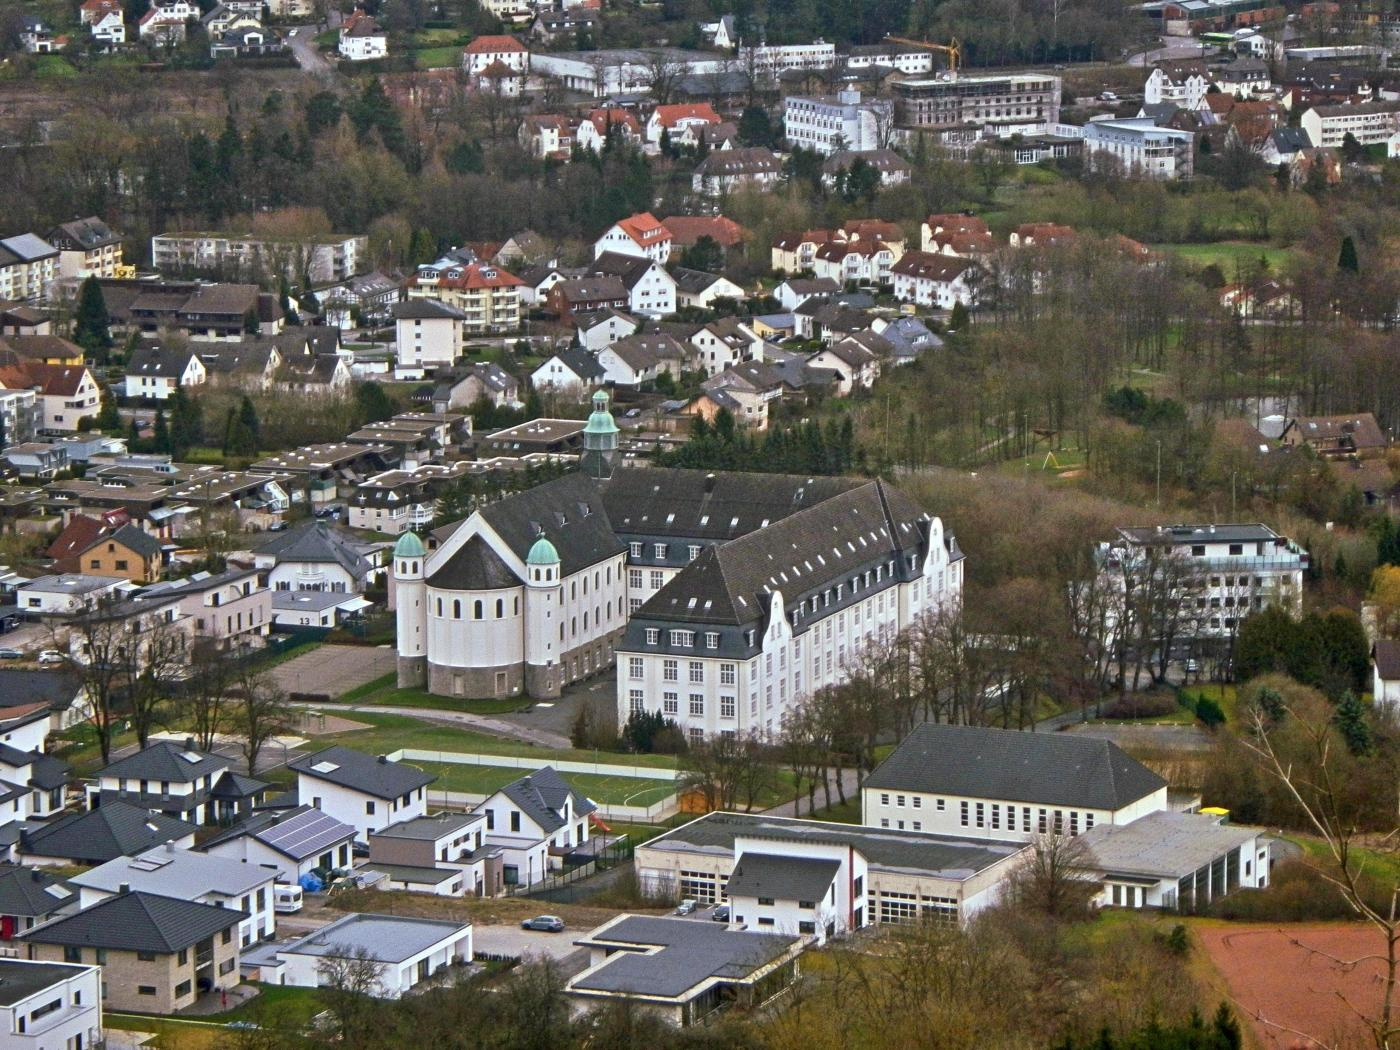 Blick auf Gymnasium St. Xaver, Bad Driburg